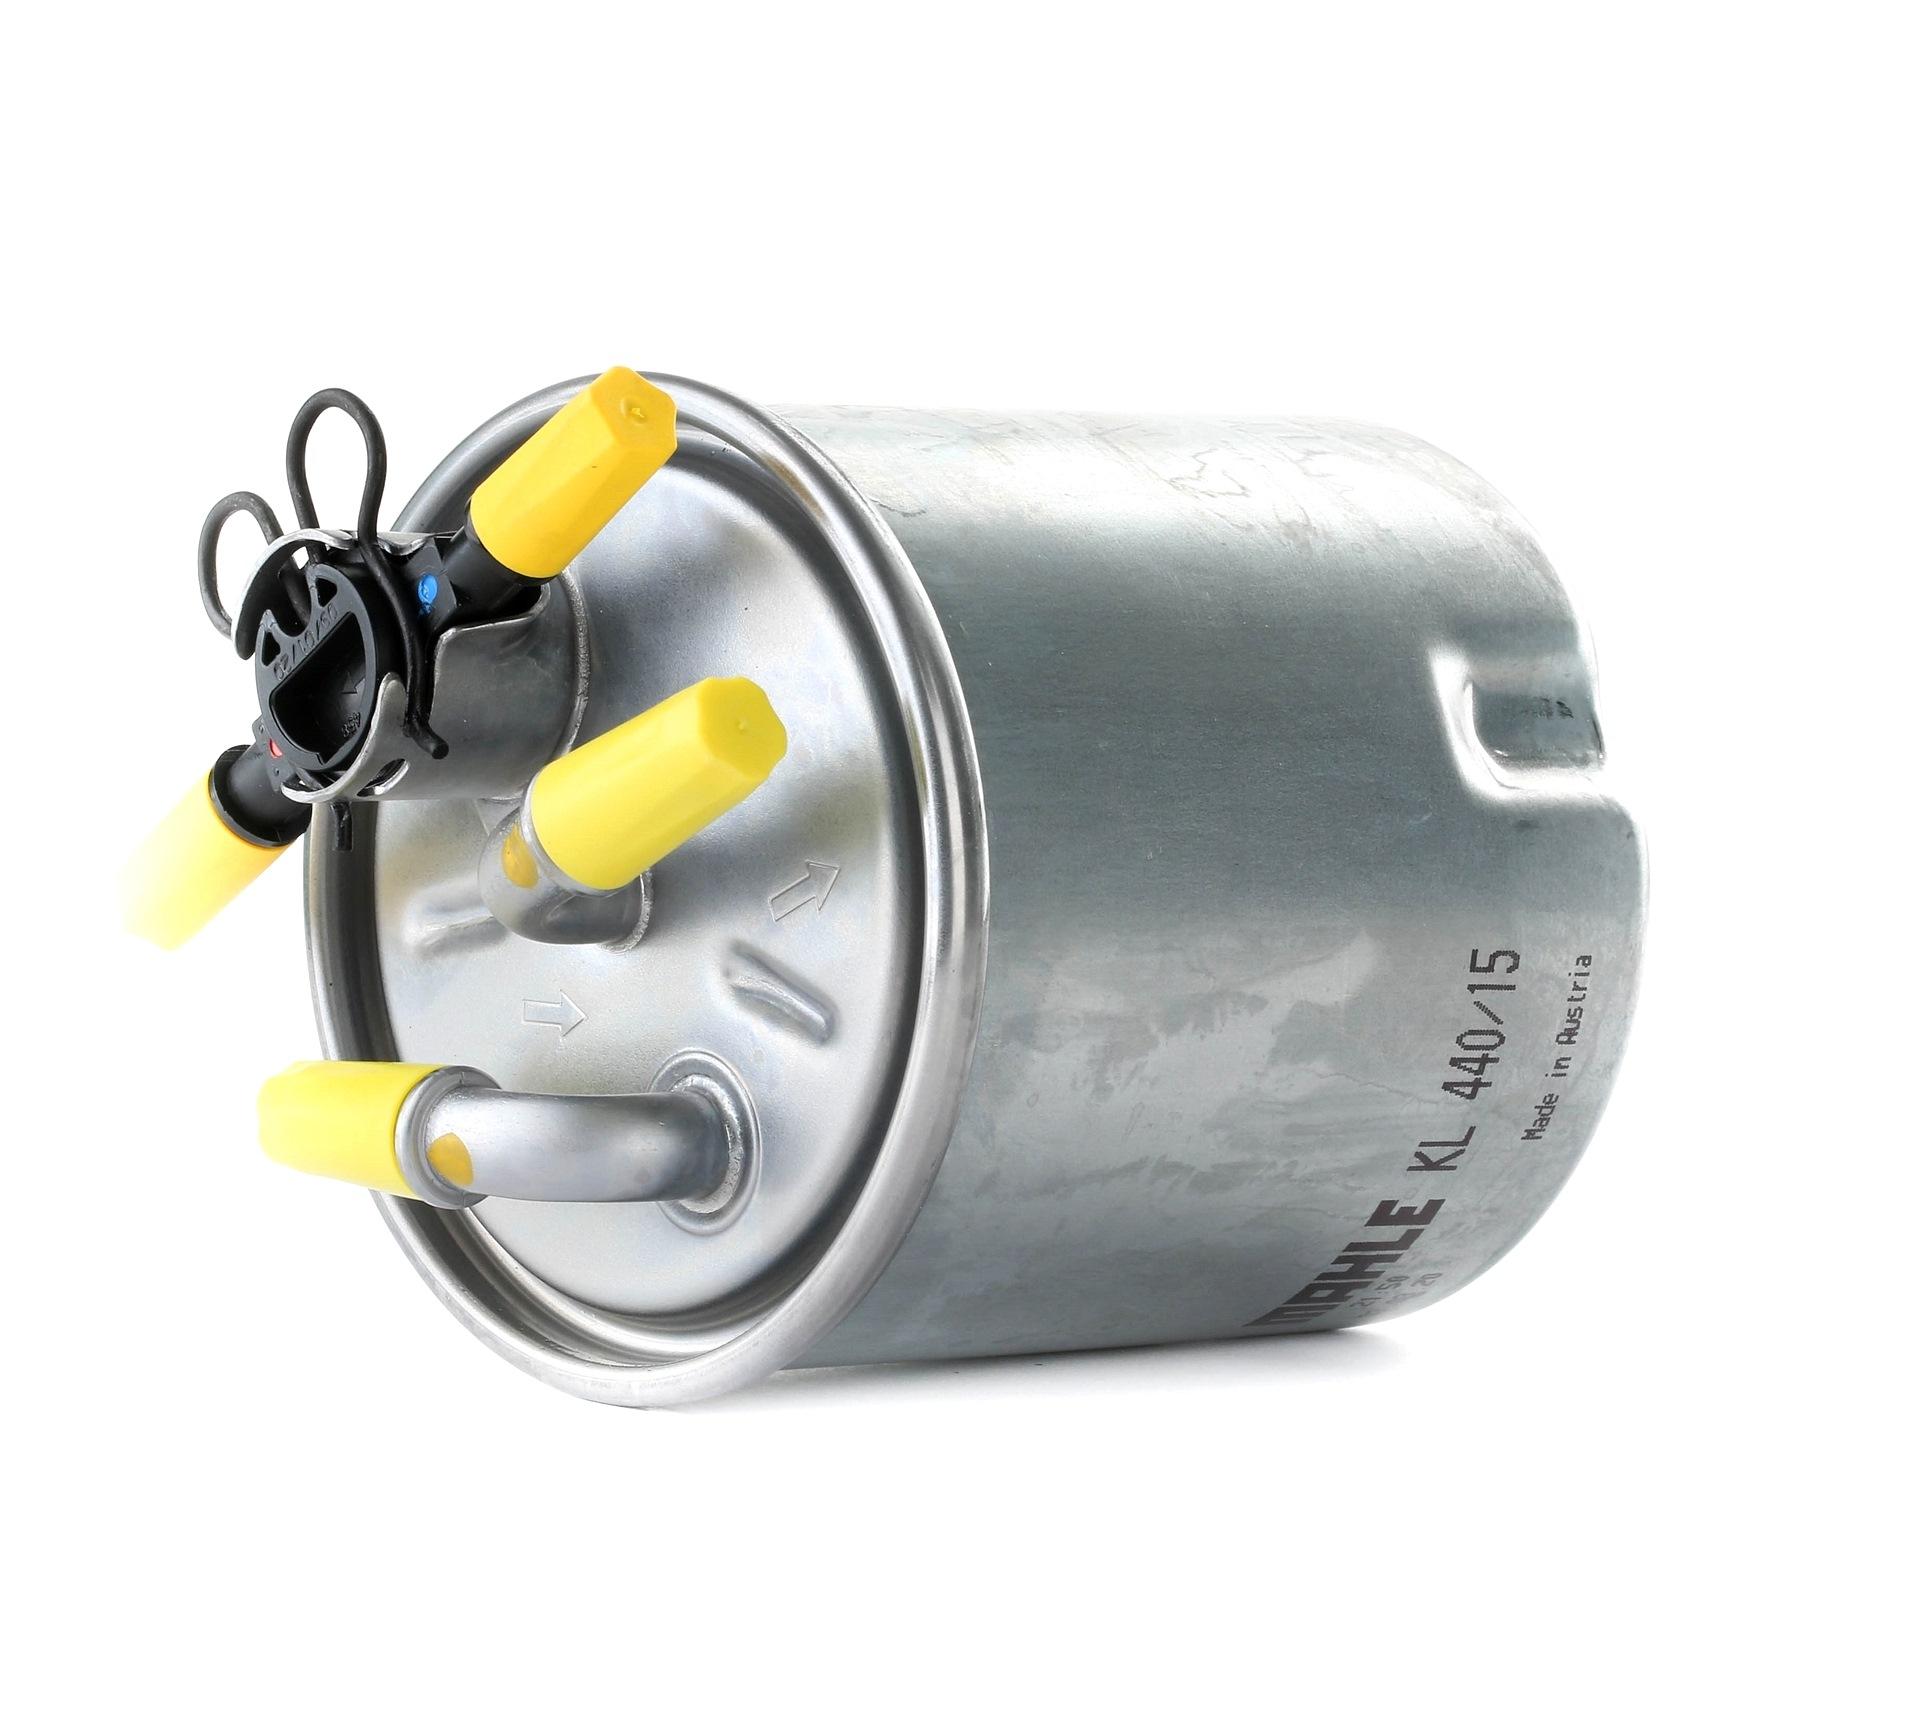 Alpine A110 MAHLE ORIGINAL Filtro carburante KL 440/15